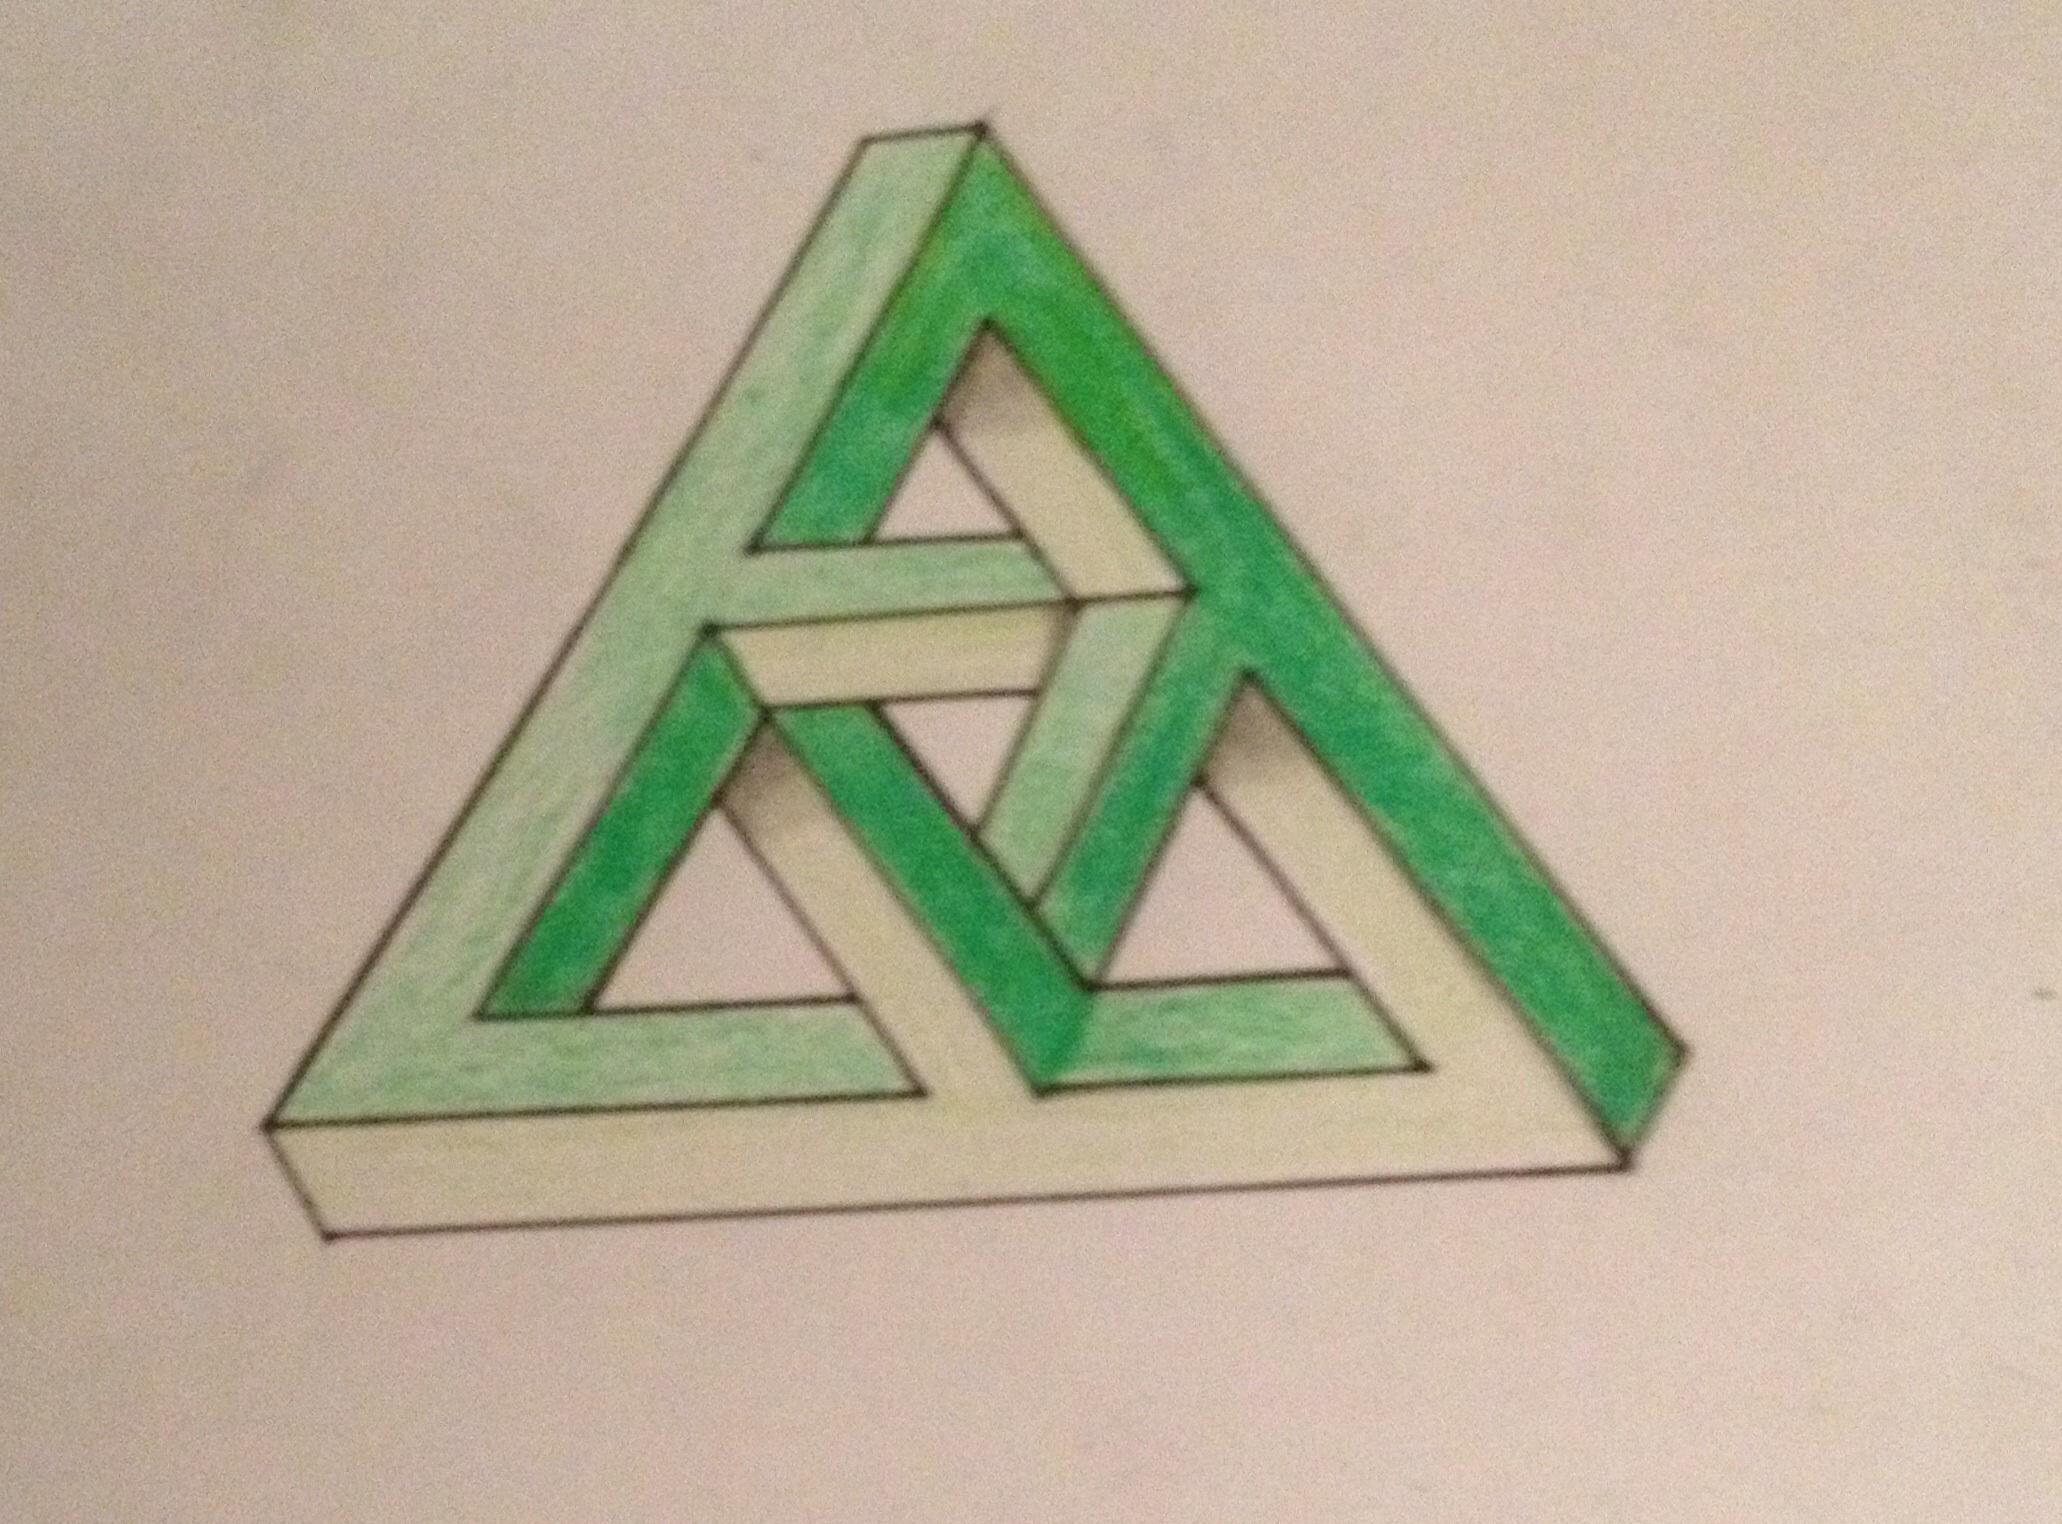 Drawn illusion impossible cube Hand I » Illusions triangle